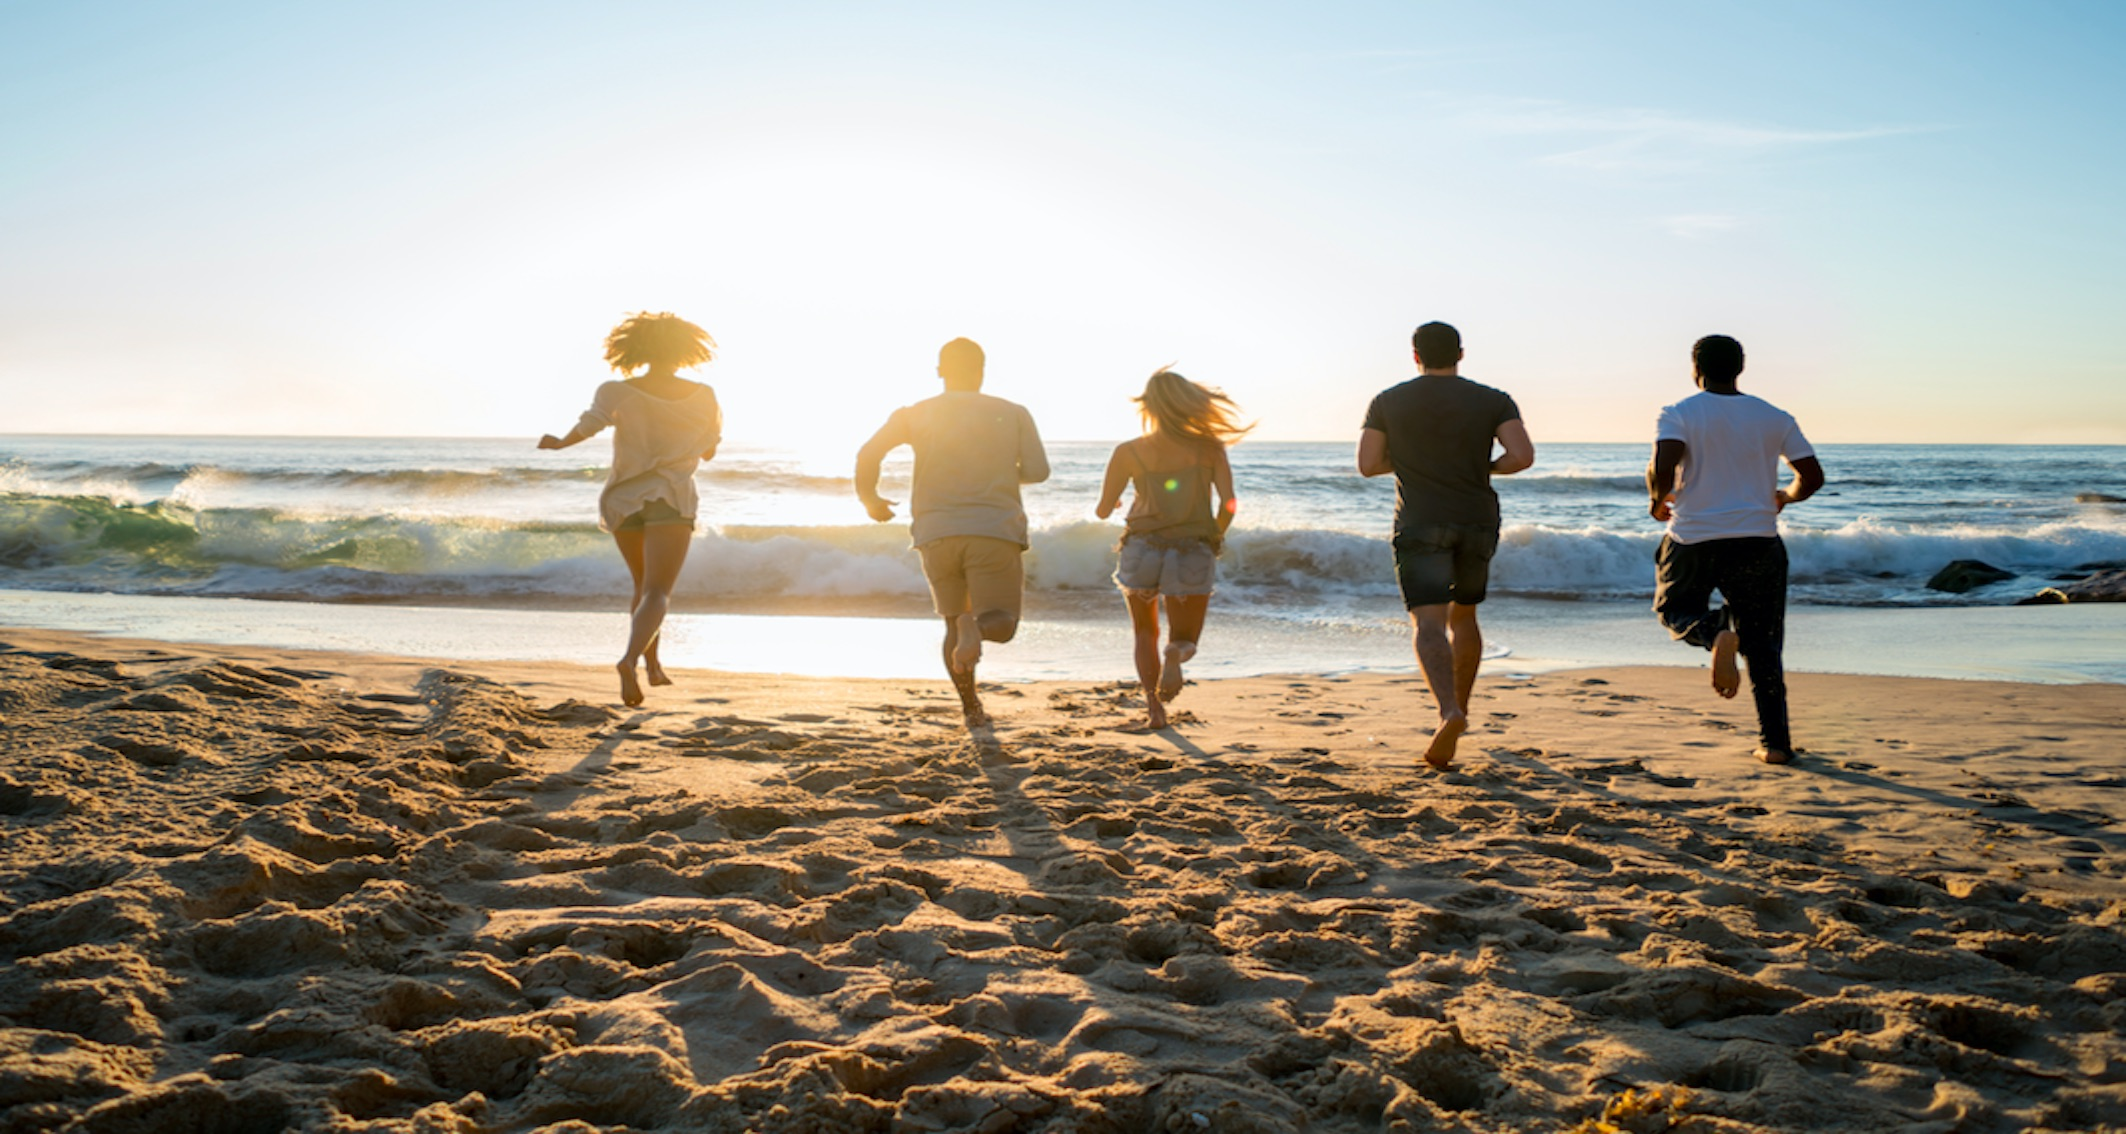 World S Best Beaches Tripadvisor Releases List Of Top 10